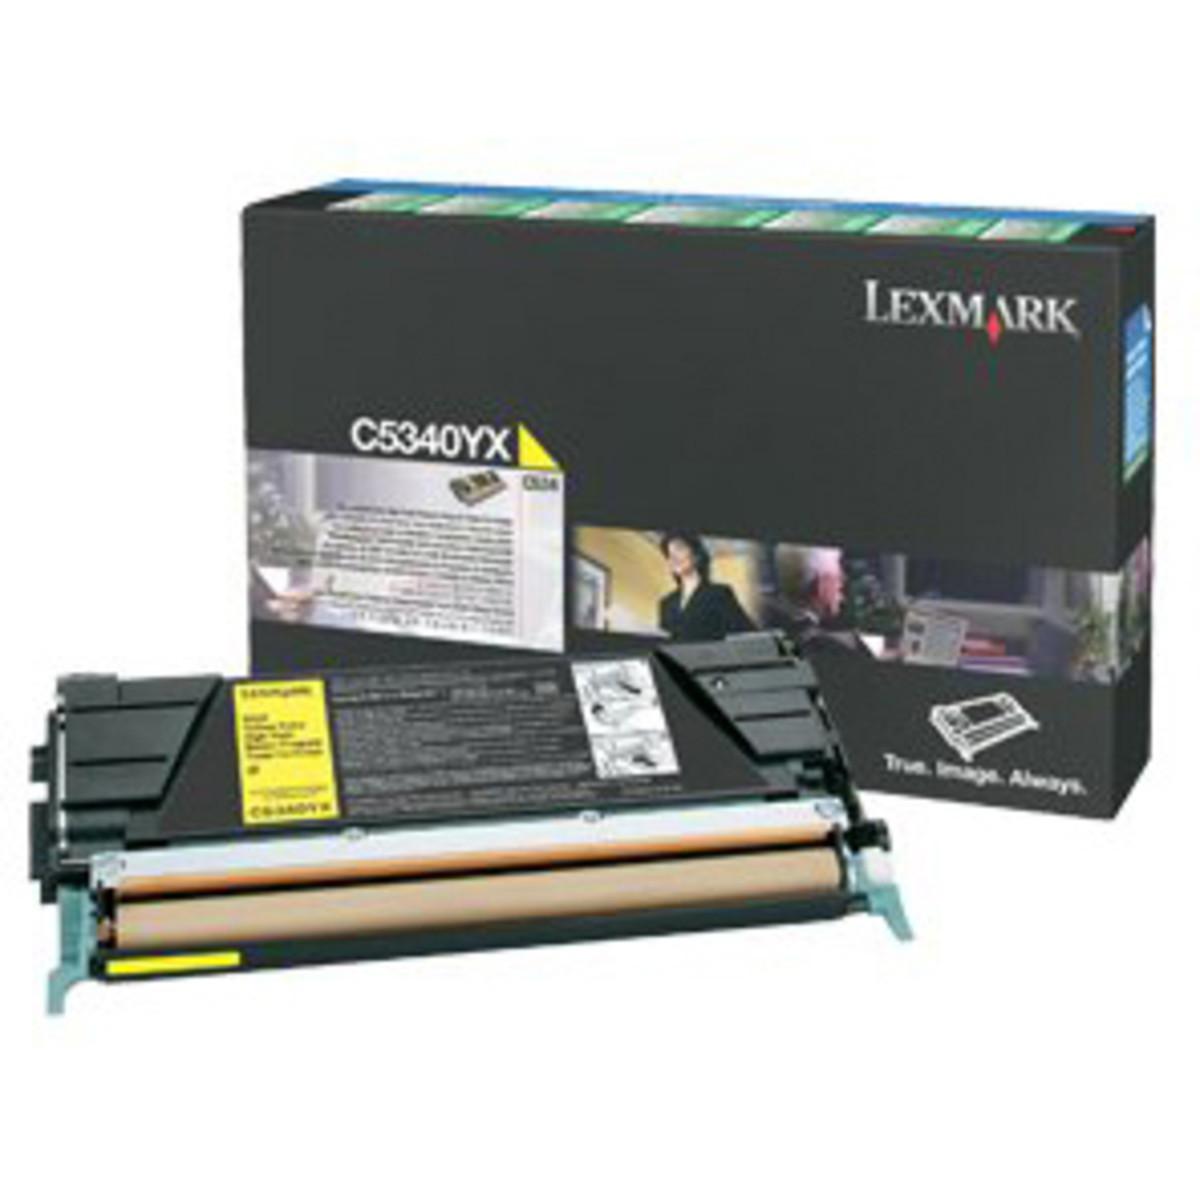 Lexmark C534DN Yellow Toner Cartridge - High Yield